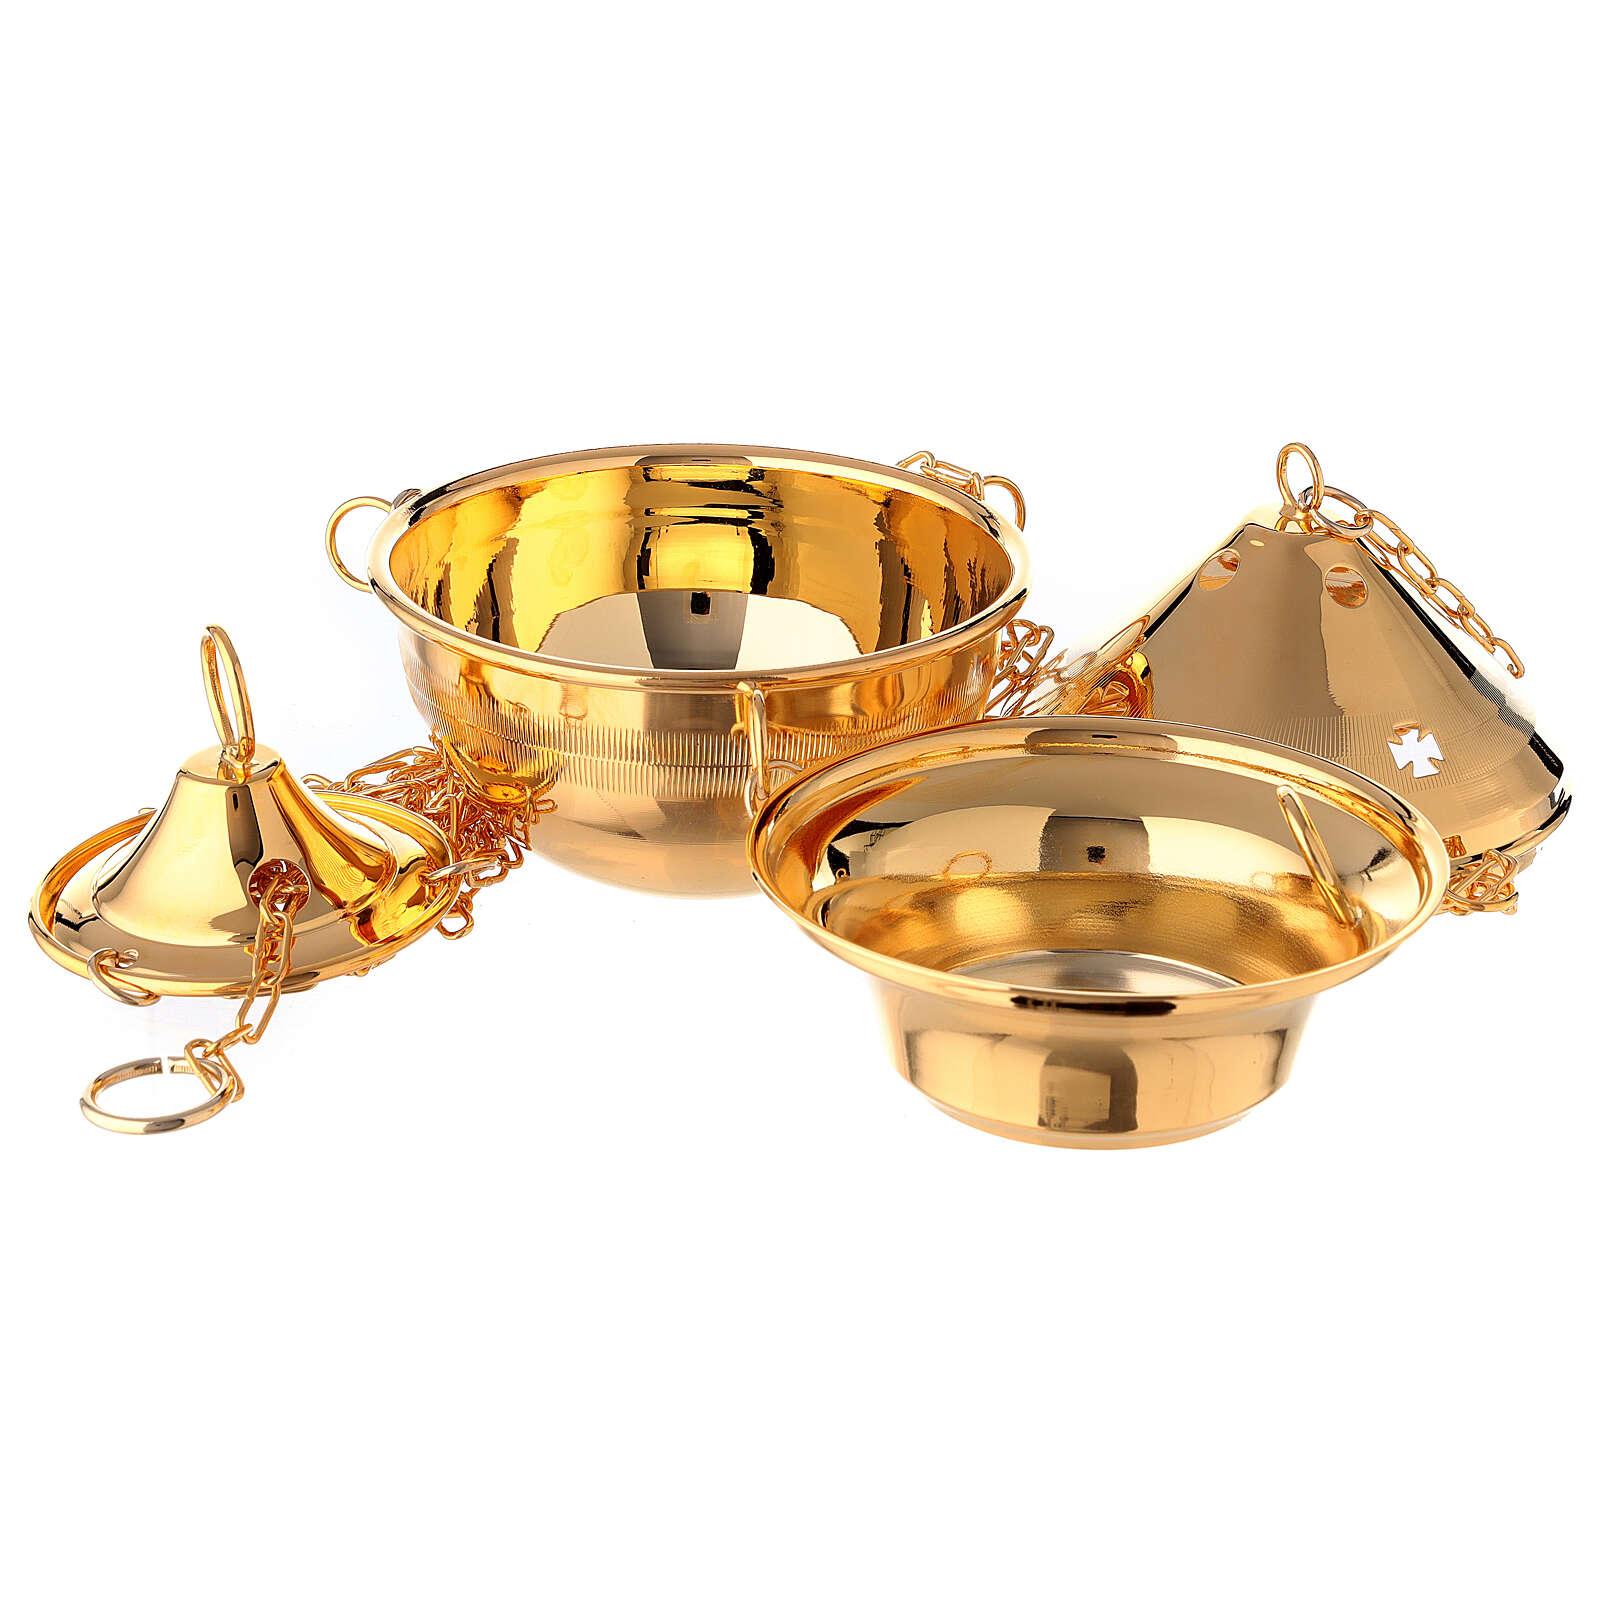 Incensario de latón dorado con naveta para incienso 3